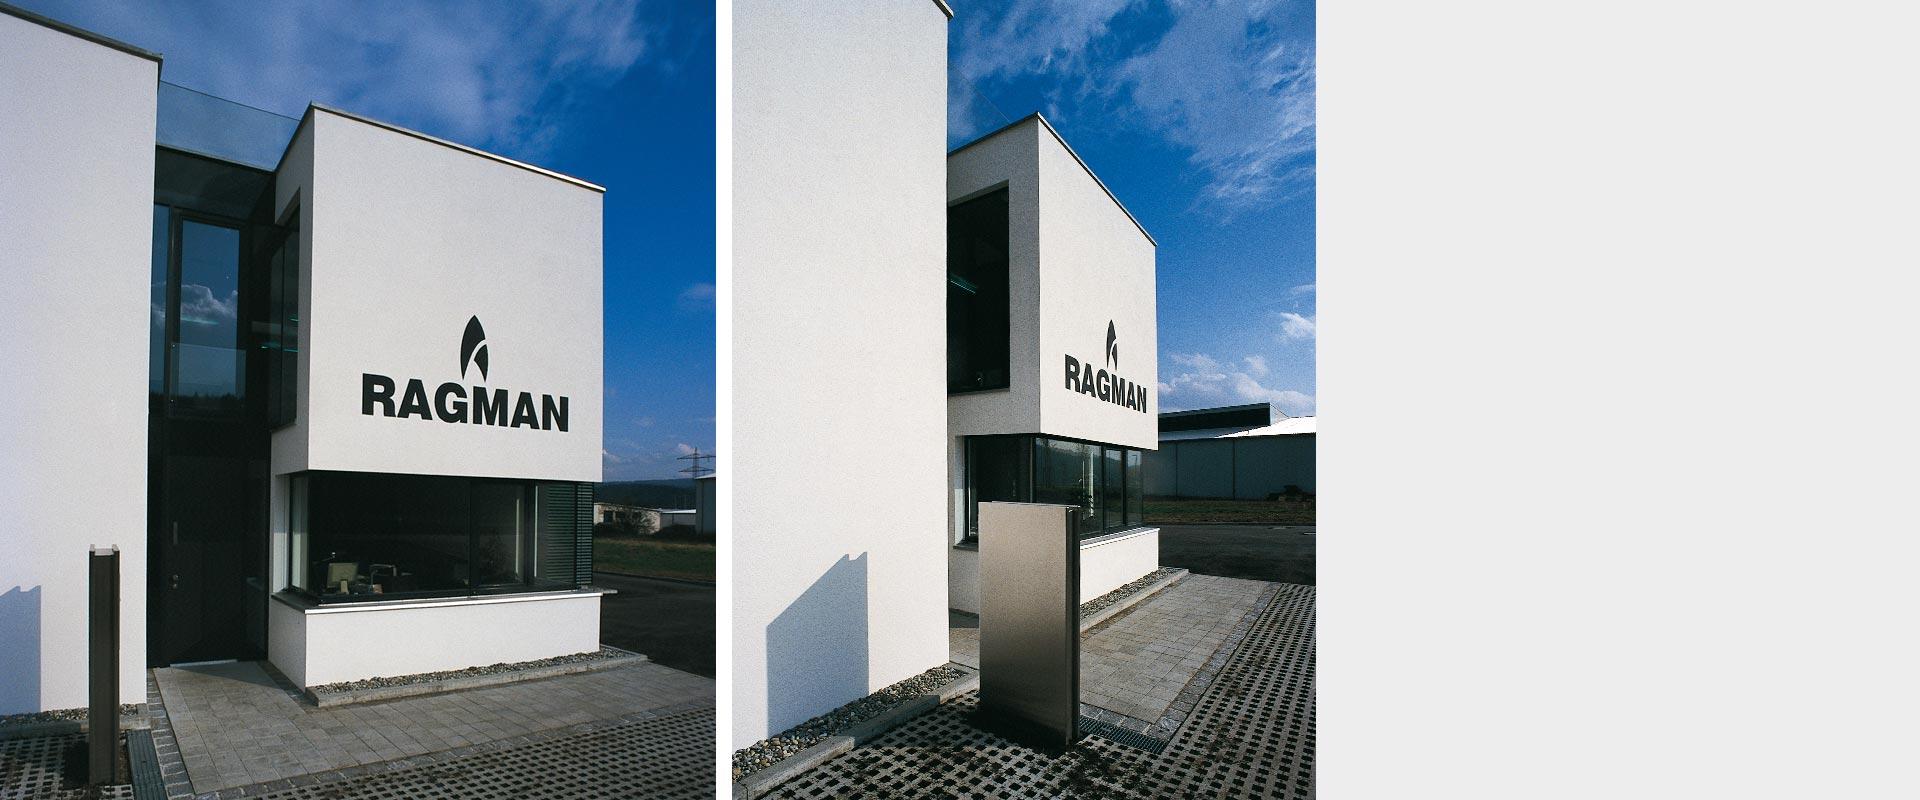 architekturbuero_henning_musahl_waldshut_ragman04